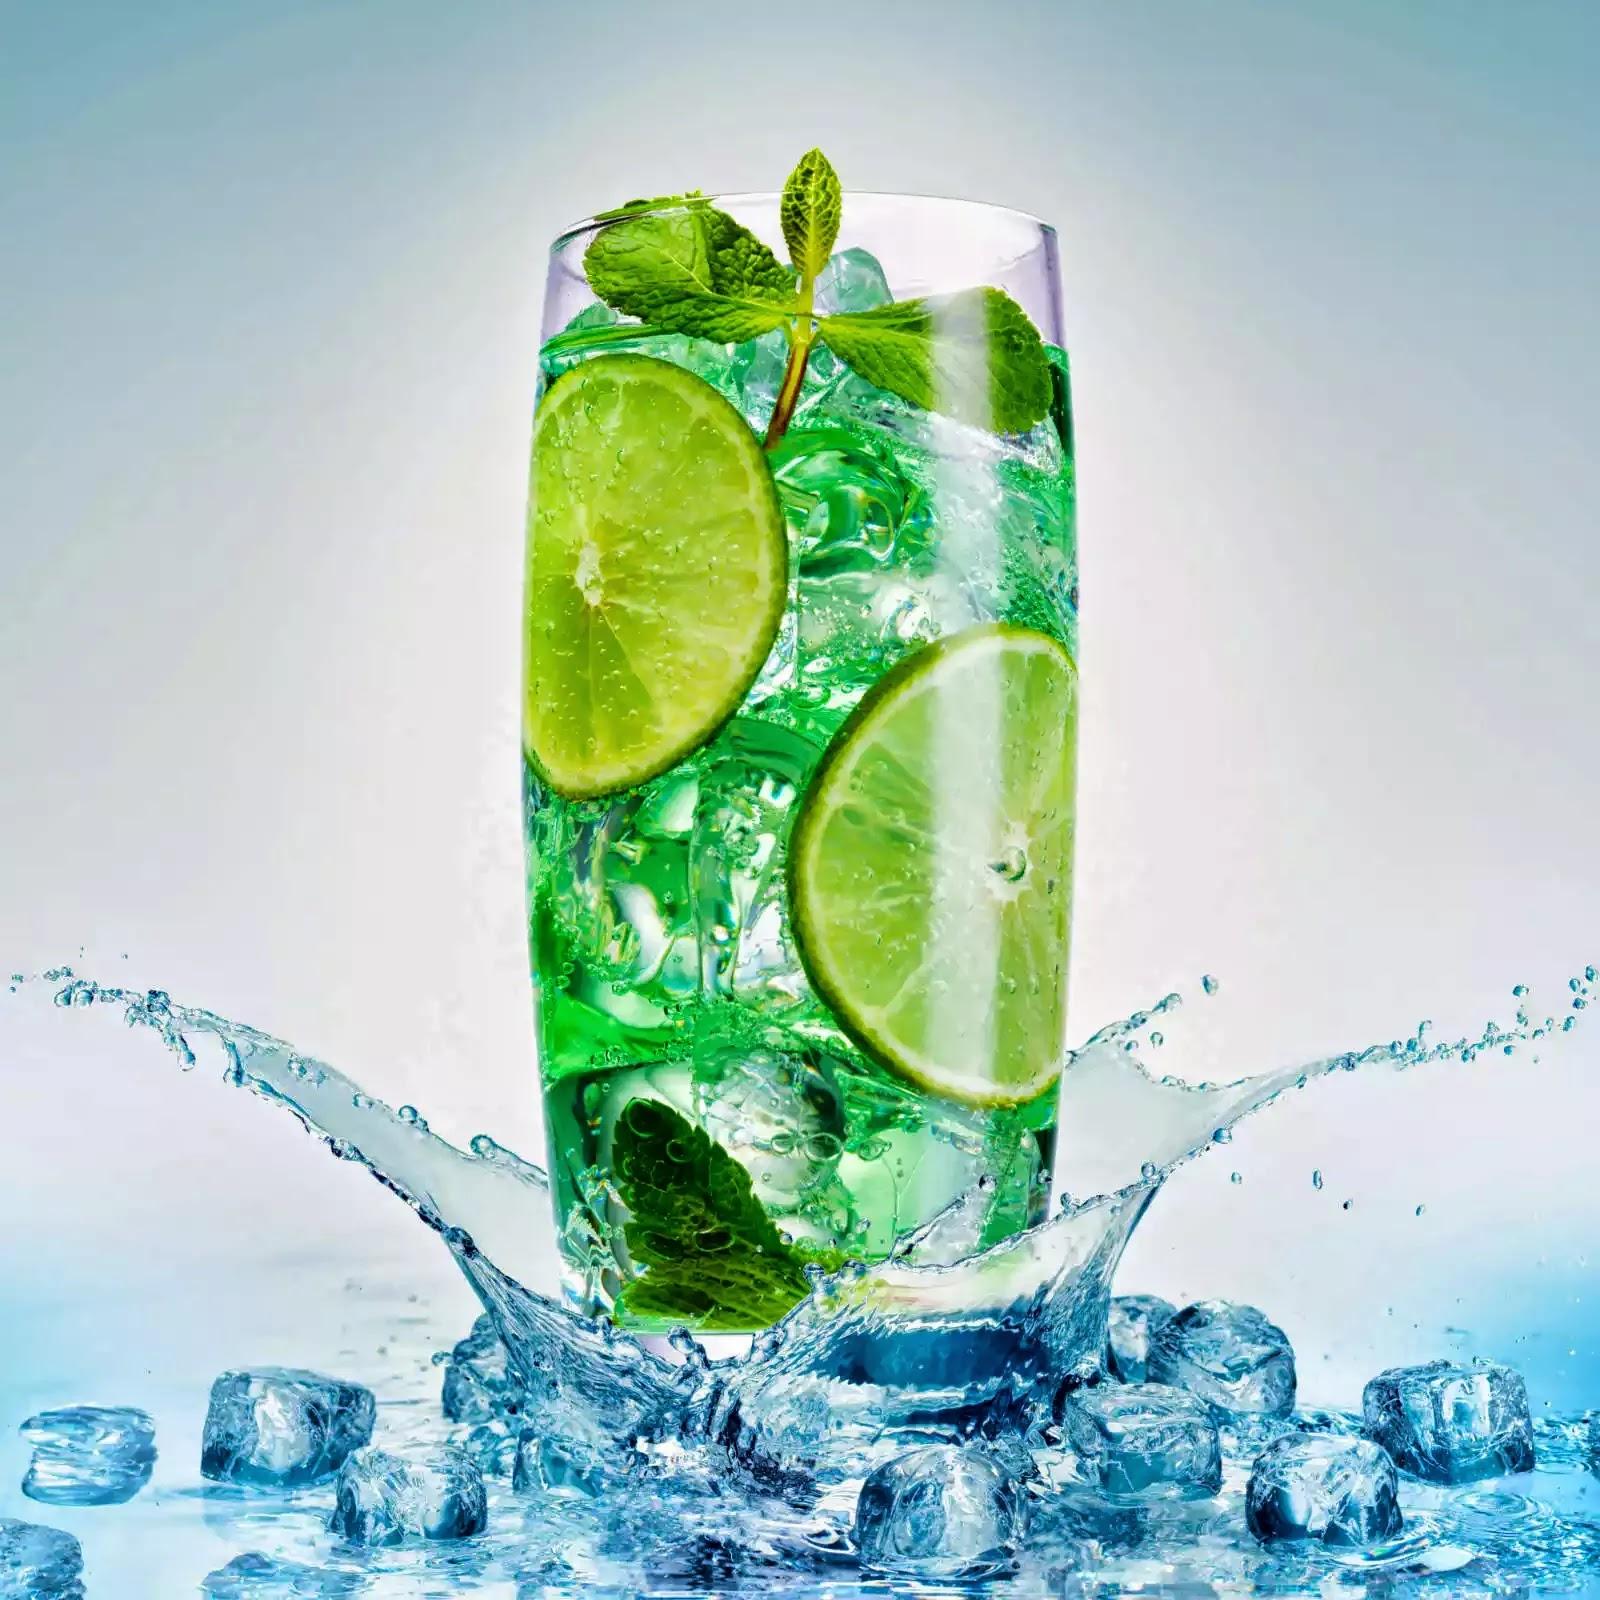 http://www.maigrirastuces.com/2015/04/incroyable-perte-de-poids-boissons-vous.html